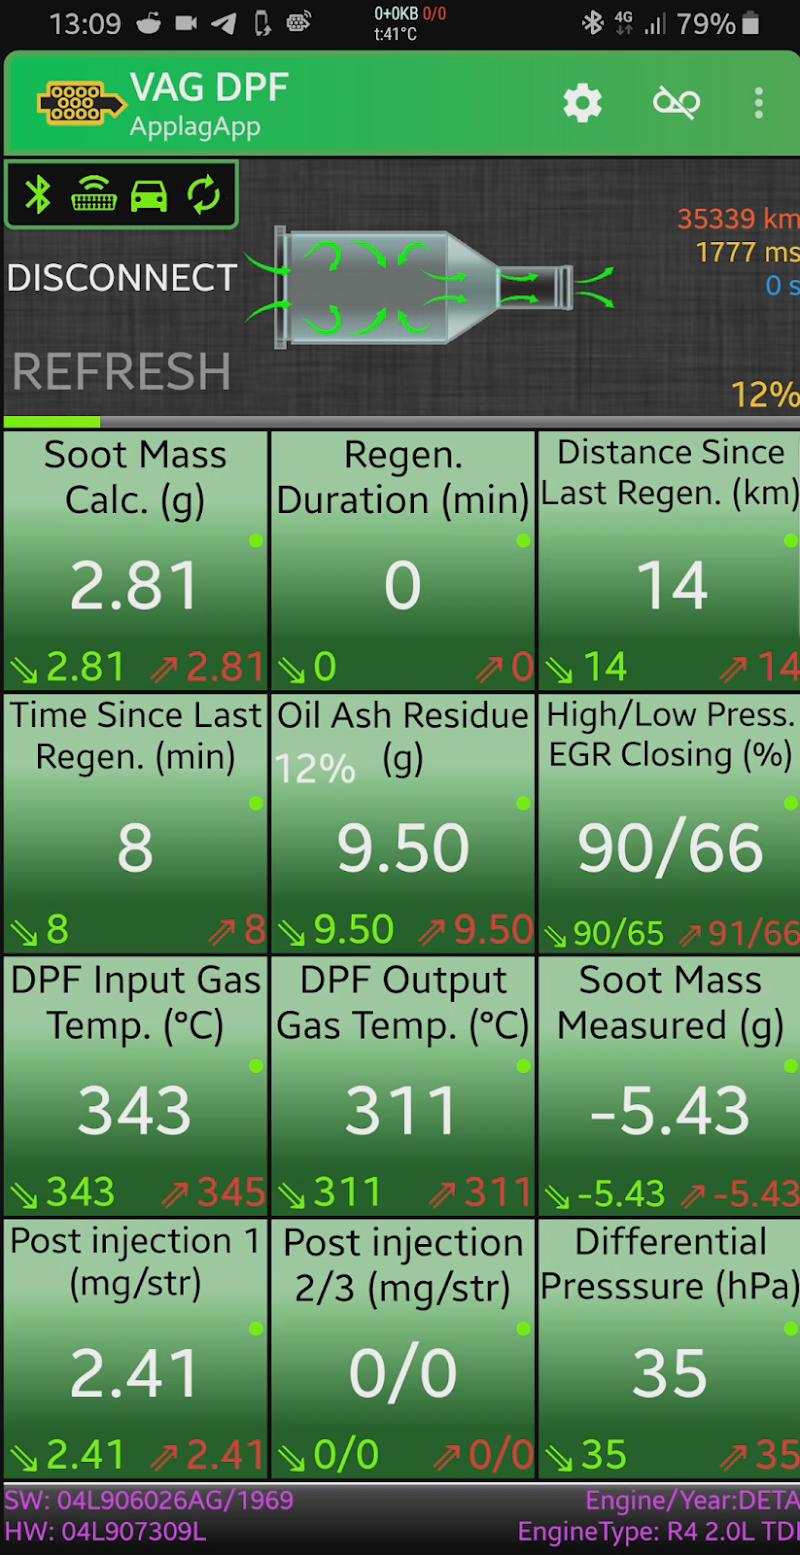 VAG DPF Screenshot 4